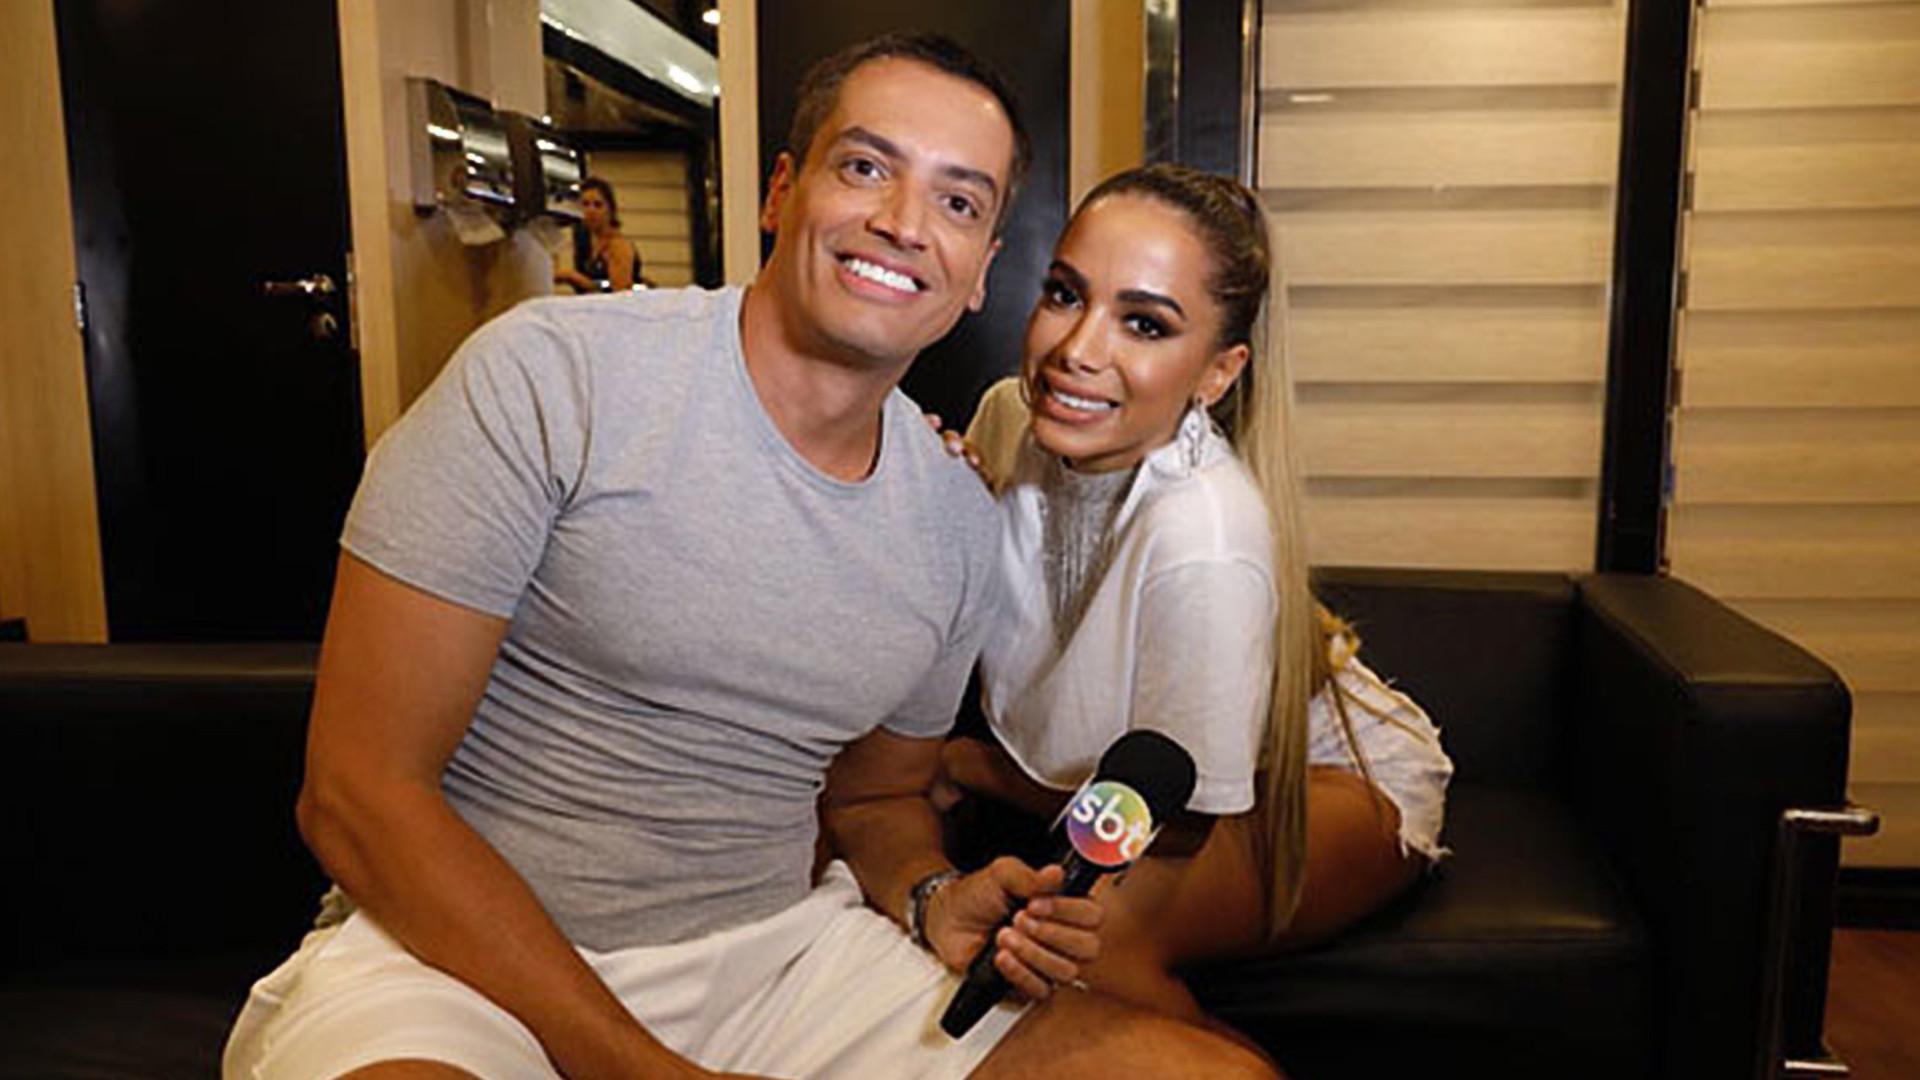 Esquema de Anitta e Léo Dias contra famosos é desmascarado